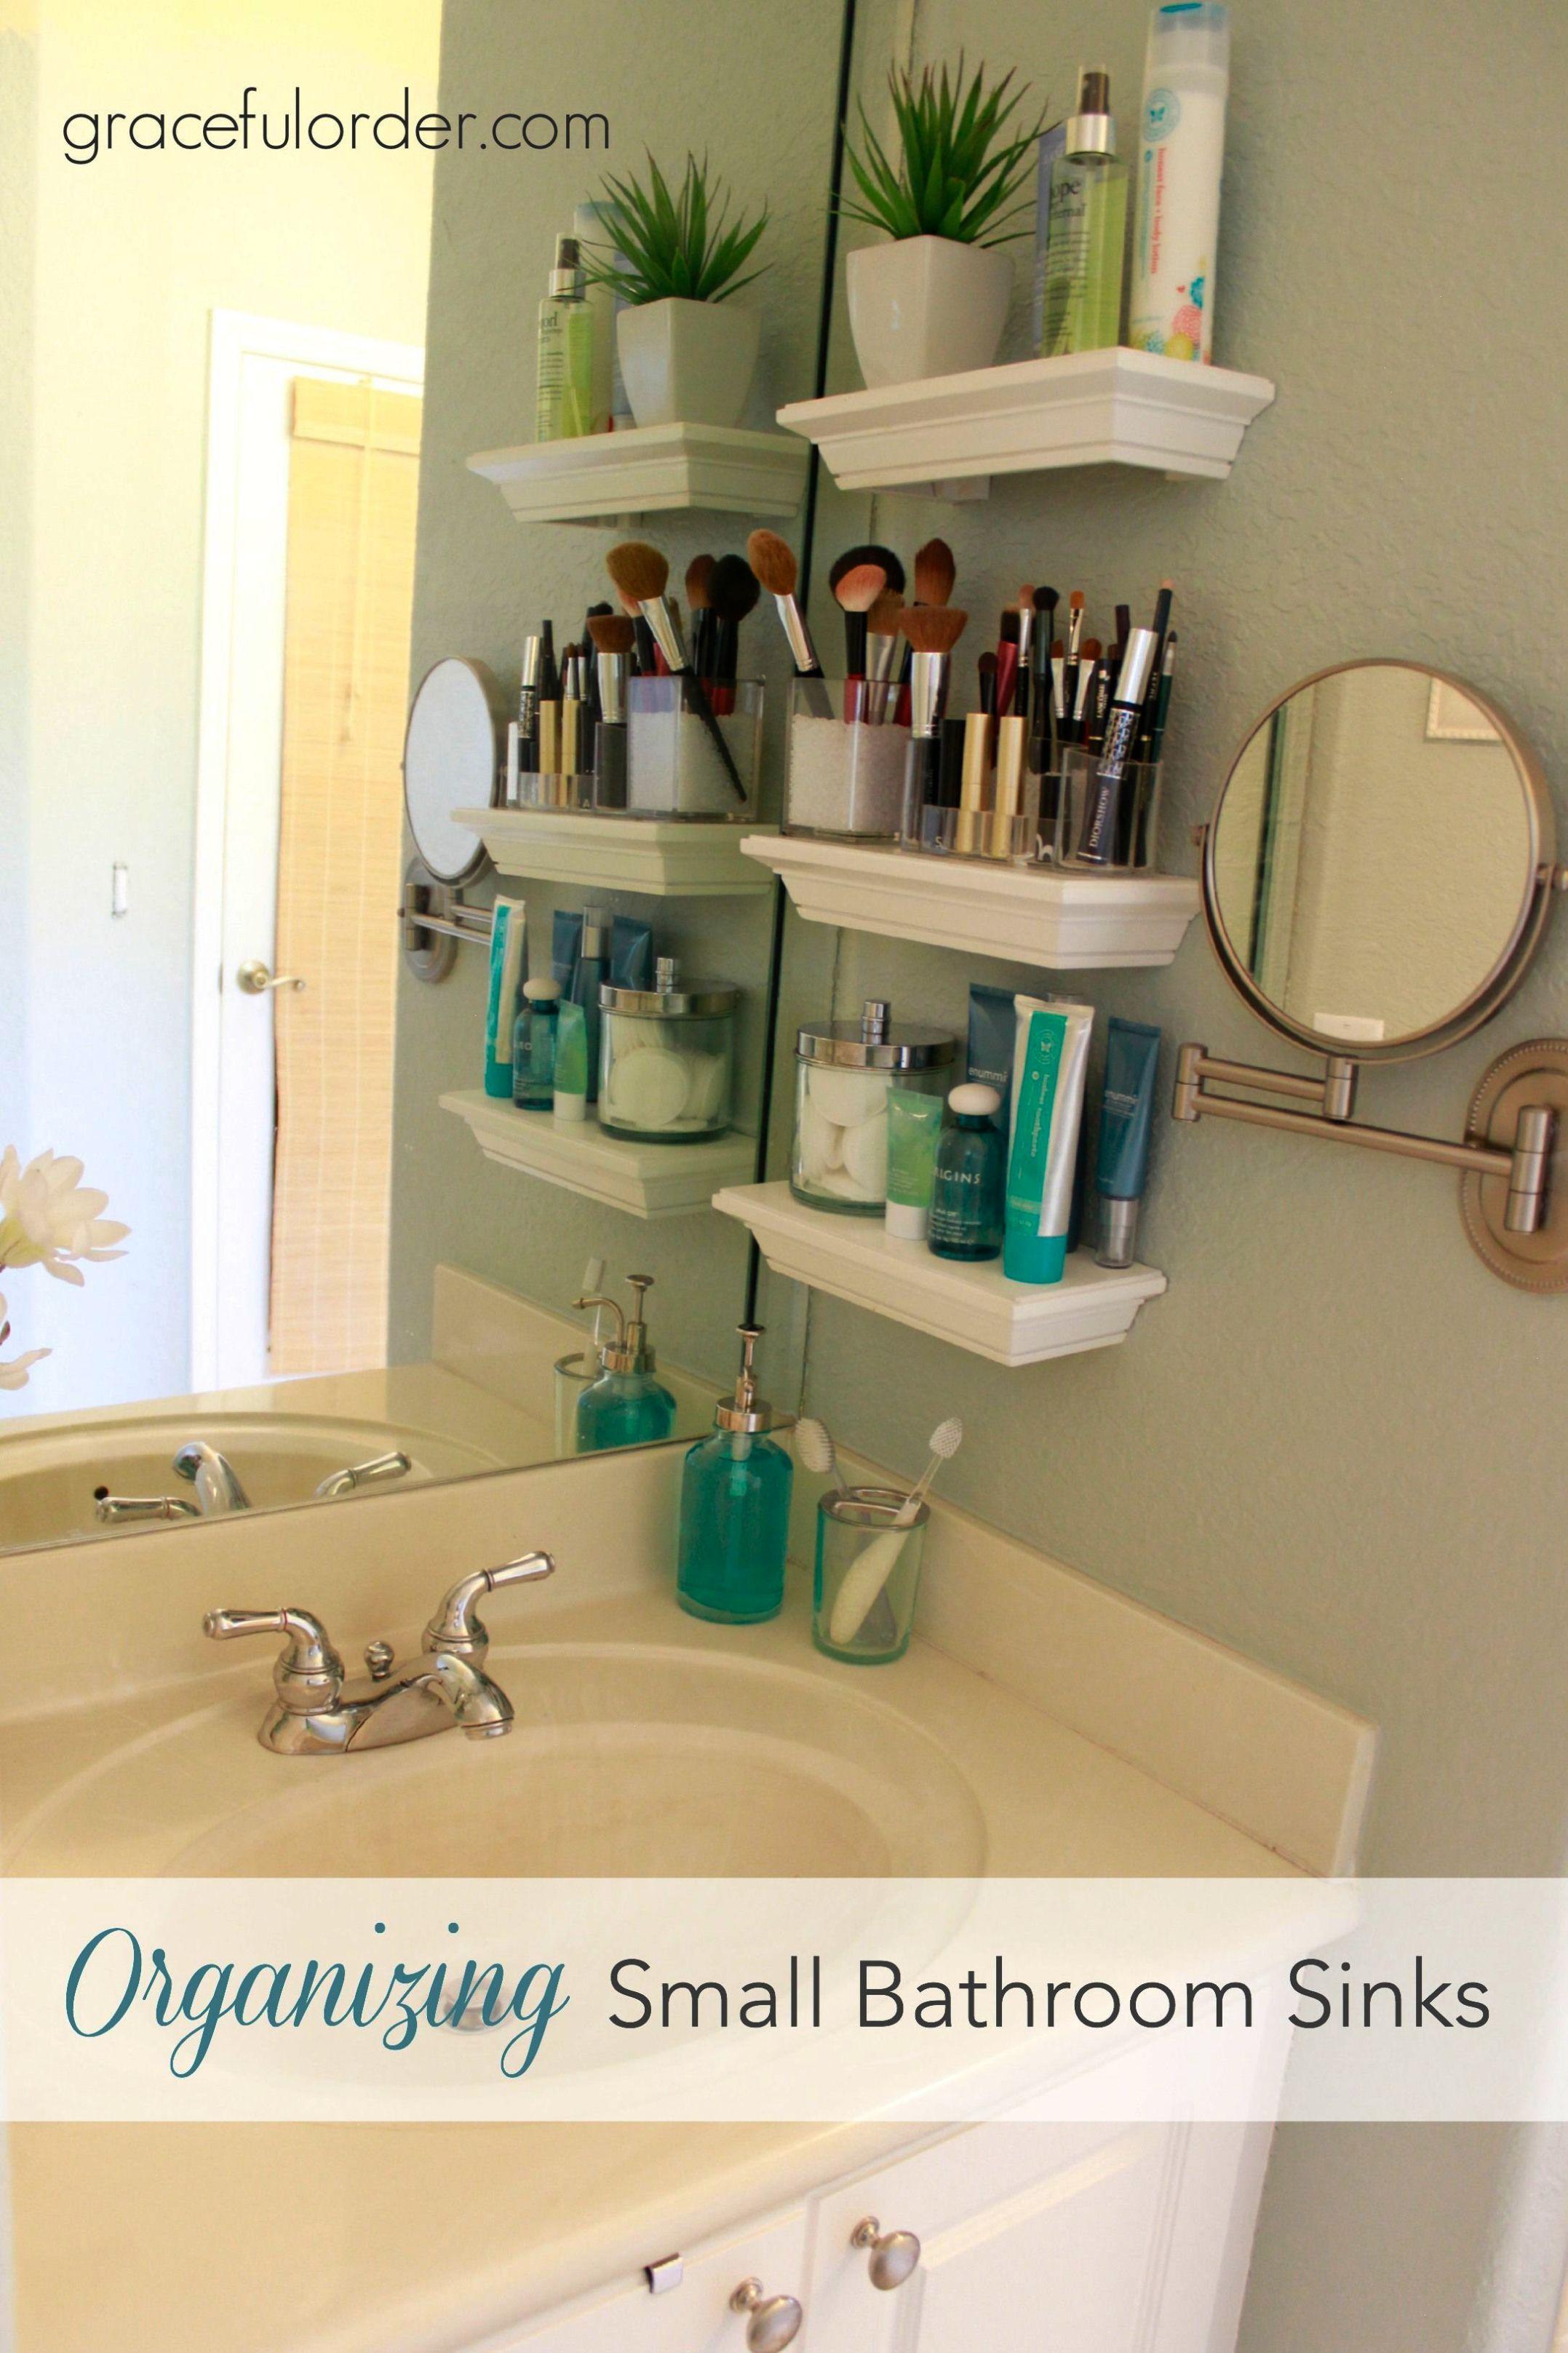 Organizing Small Bathroom Sinks Our House Pinterest Bathroom